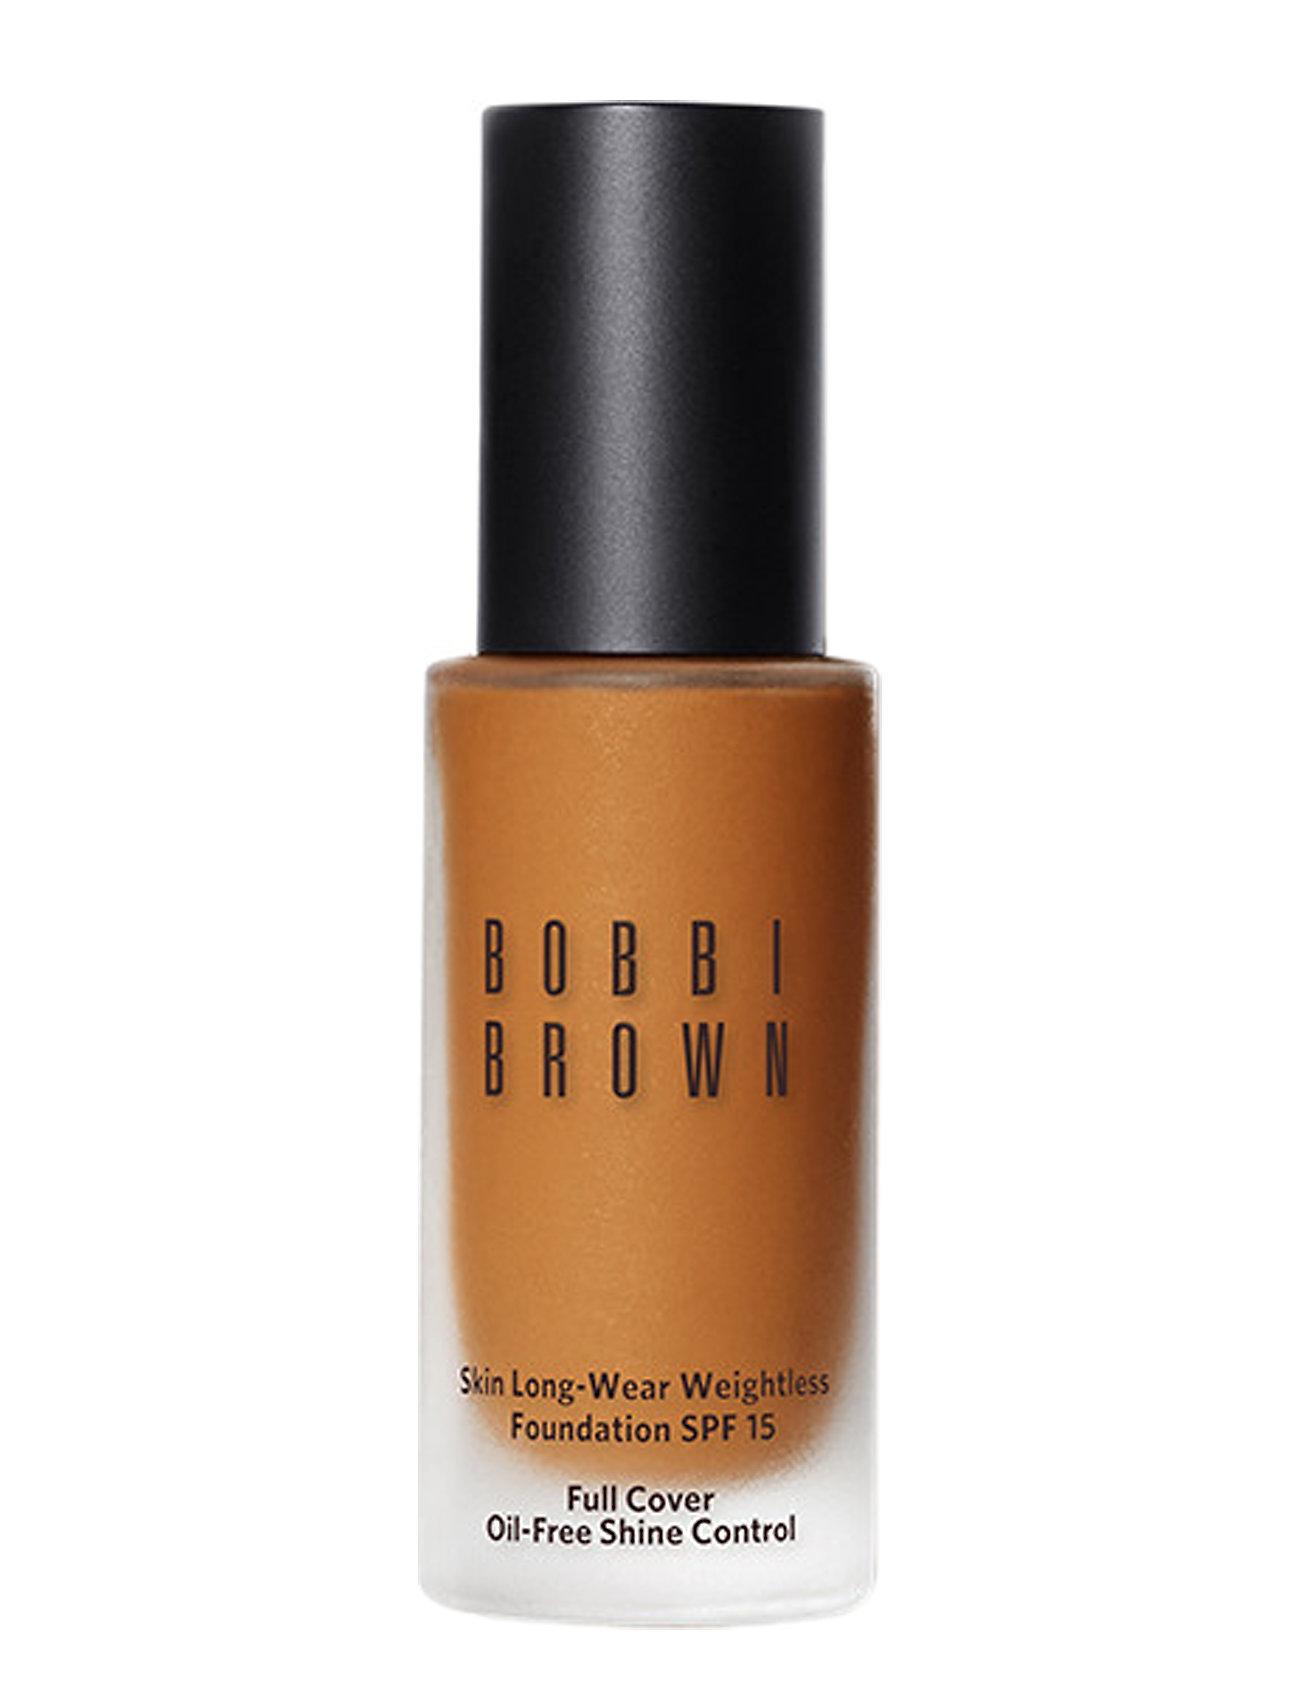 Bobbi Brown Skin Long-Wear Weighless Foundation SPF15 - GOLDEN